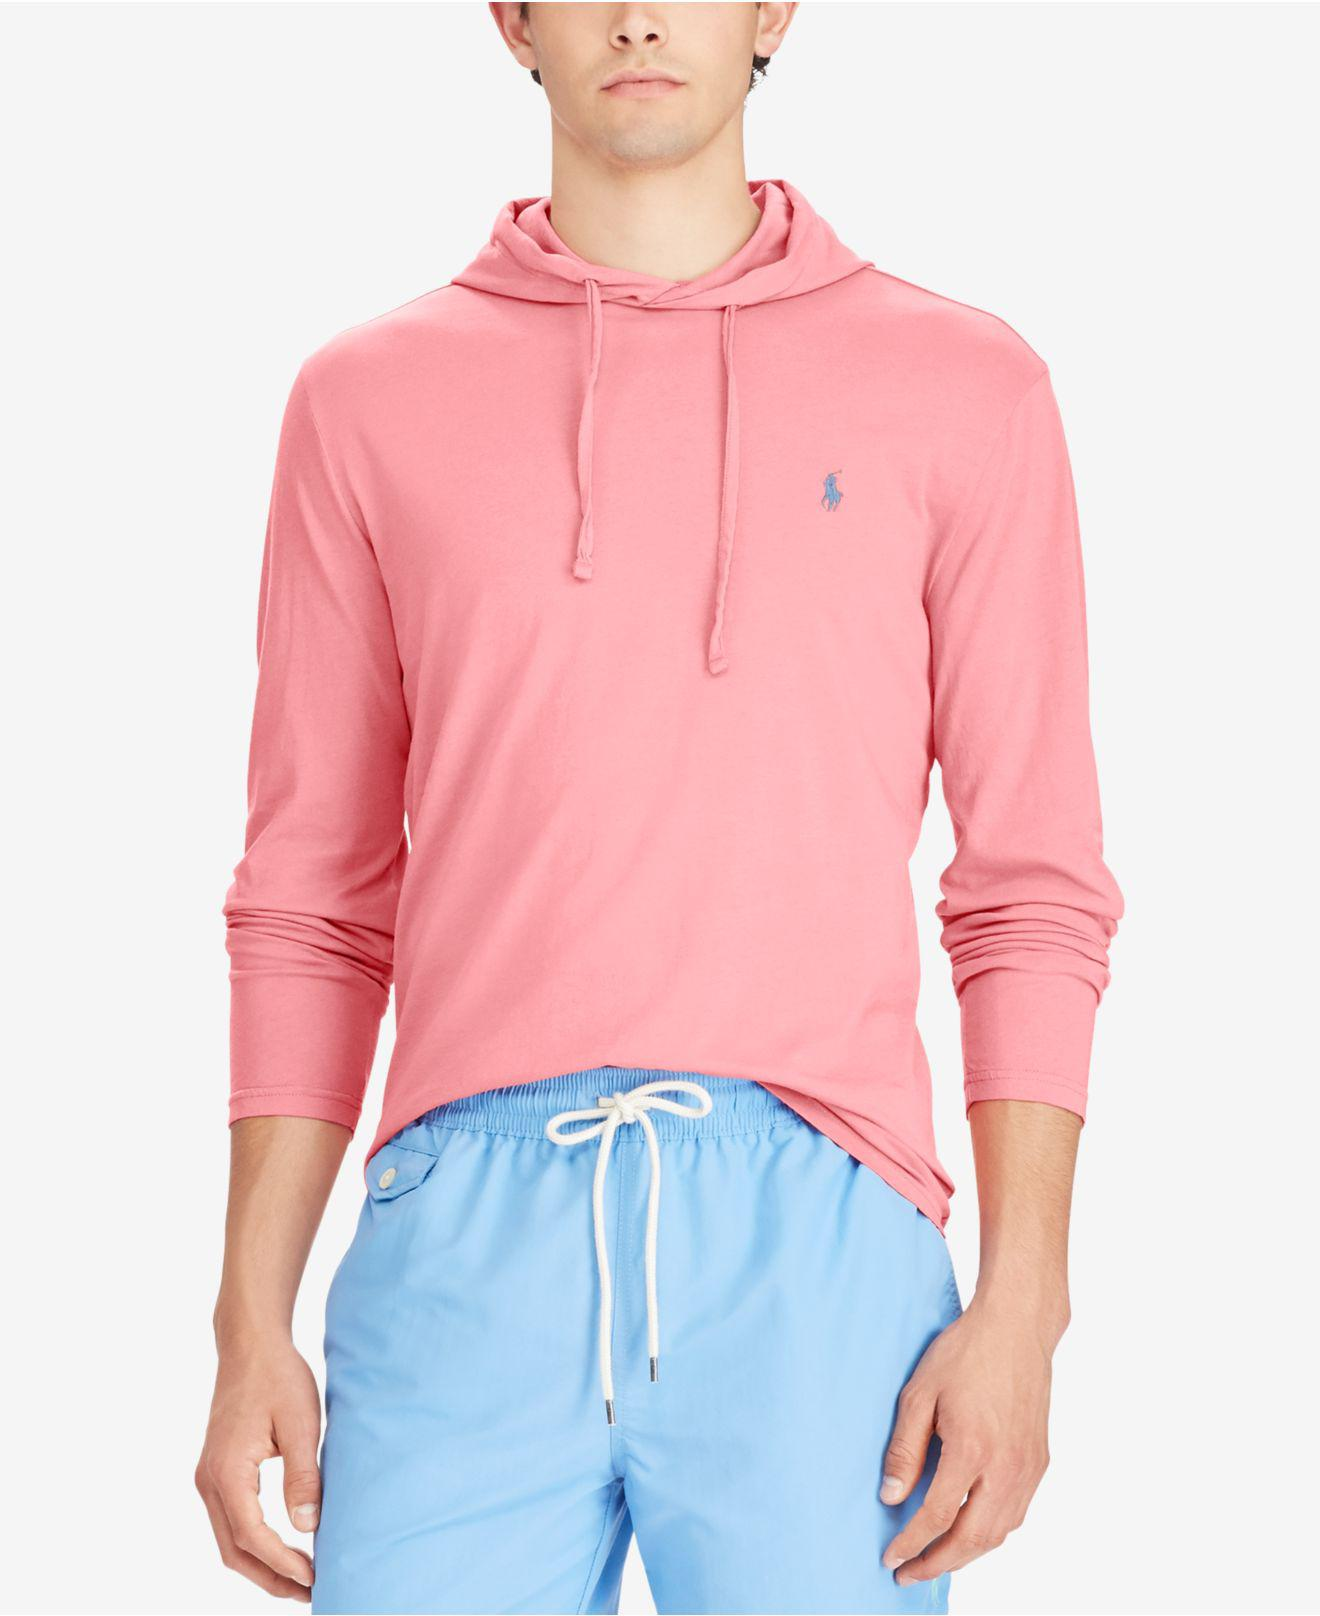 2e43fa27 ... shop best price lyst polo ralph lauren mens jersey t shirt hoodie for  men 65ce2 d8a4c